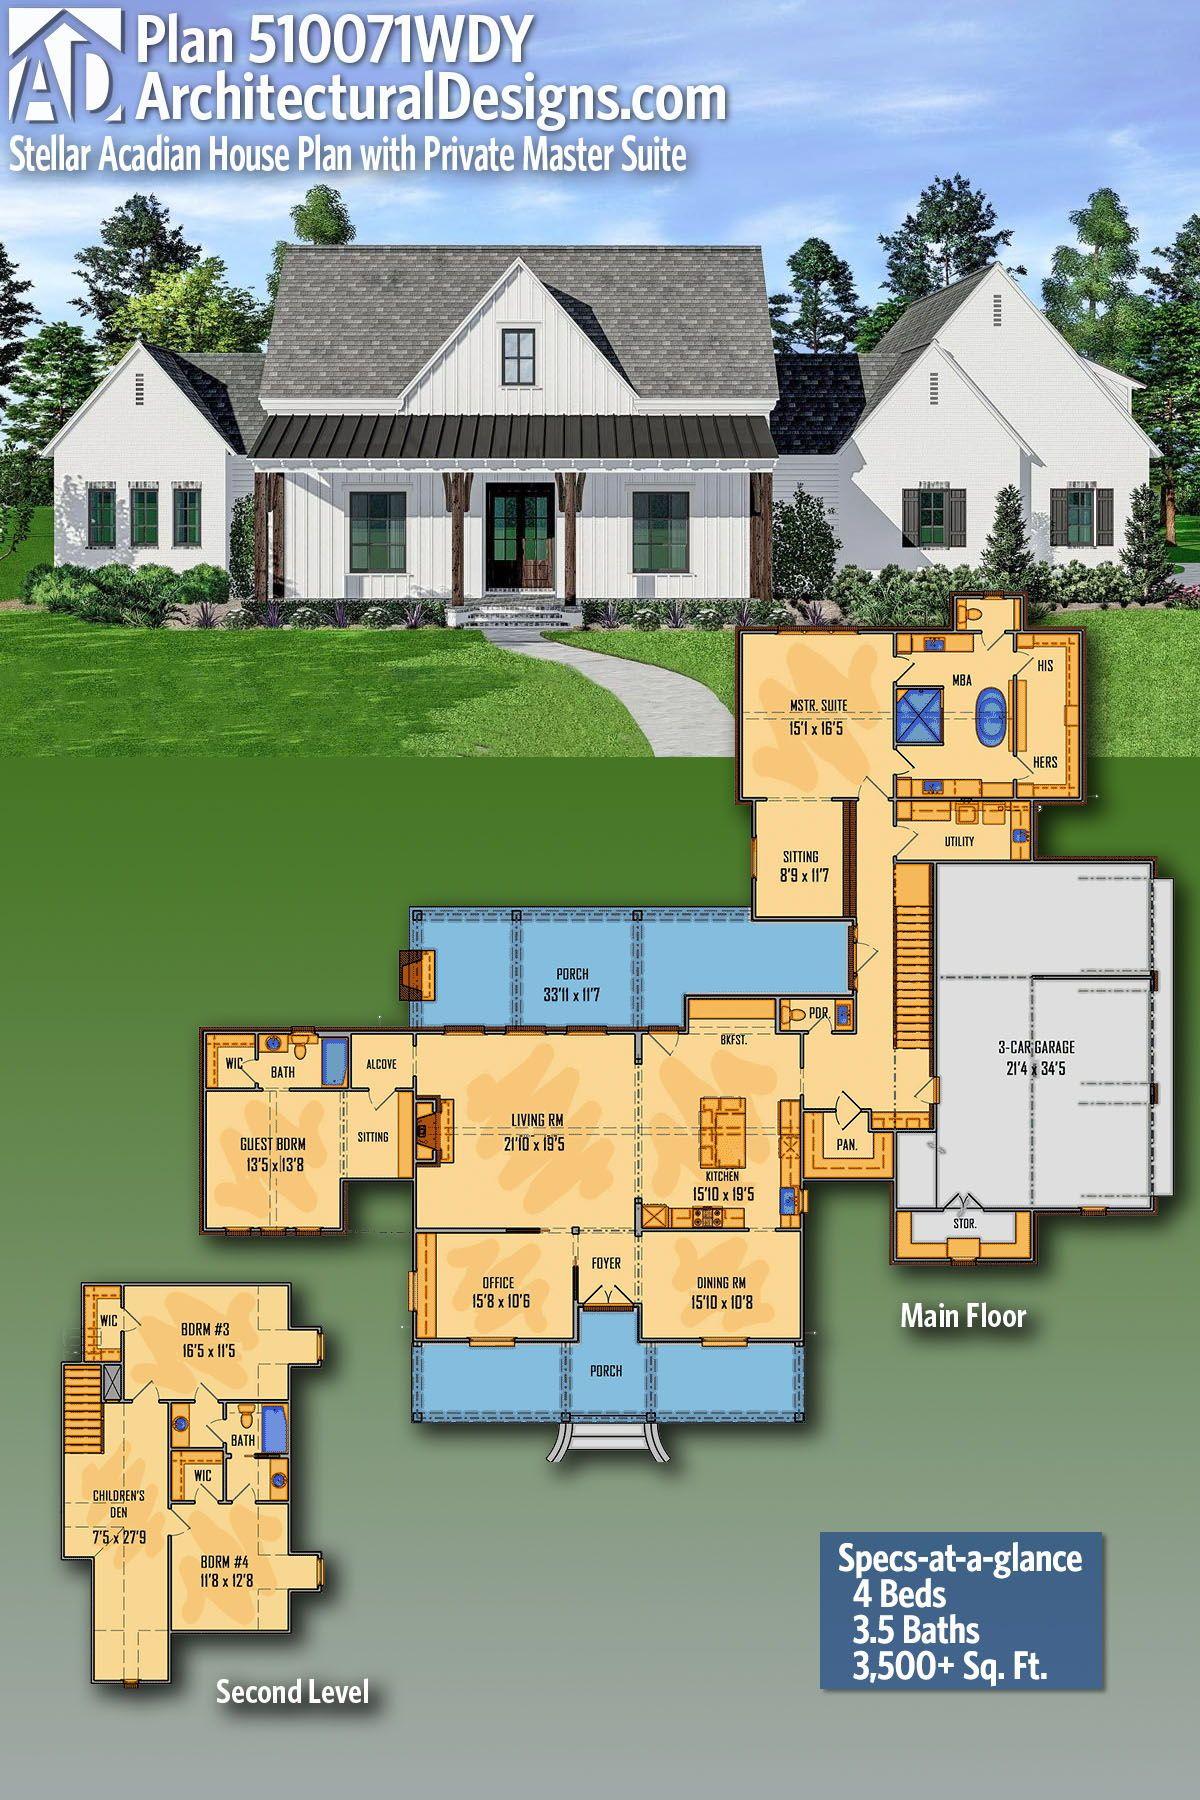 Plan 510062wdy Split Bedroom House Plan With Large Walk Through Pantry House Plans Acadian House Plans Farmhouse Plans